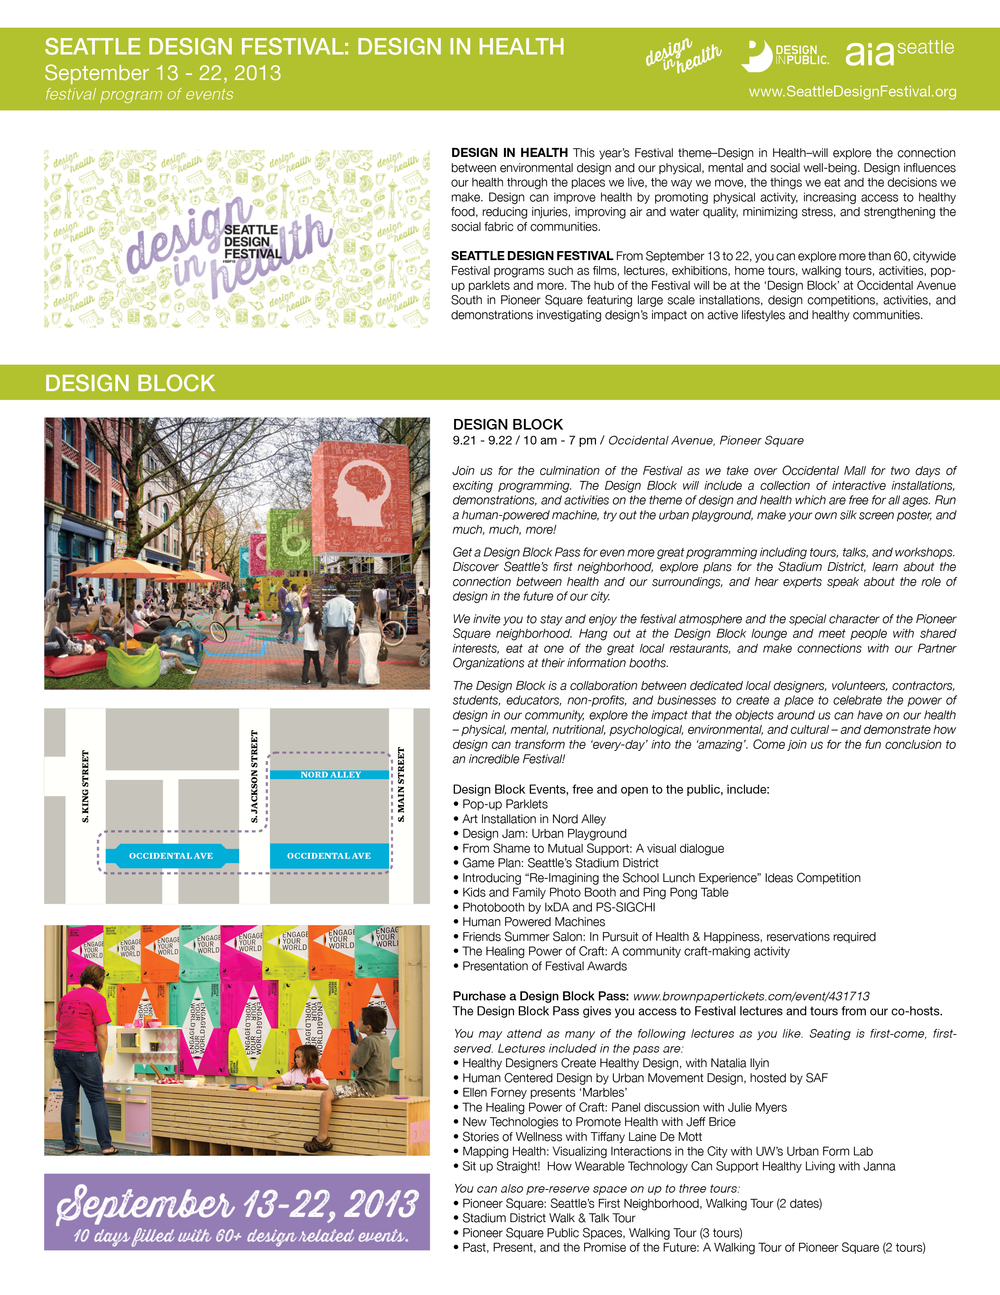 SDF13_festival program_of_events_web2.jpg